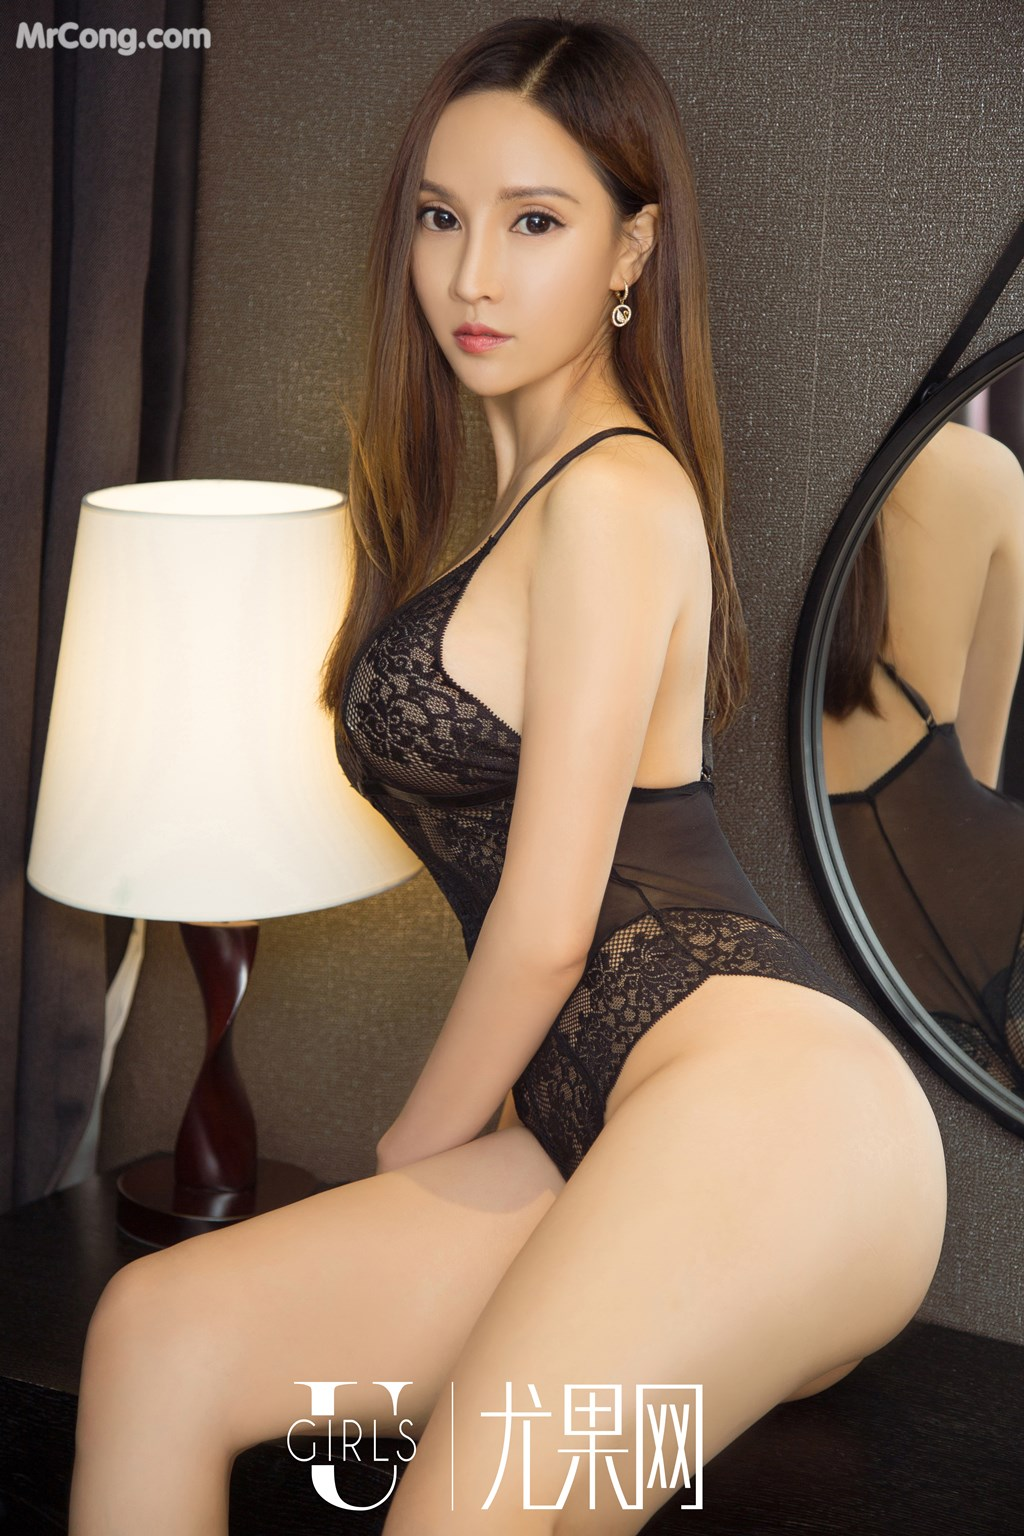 Image UGIRLS-U378-Ning-Xia-MrCong.com-006 in post UGIRLS U378: Người mẫu Ning Xia (宁夏) (66 ảnh)